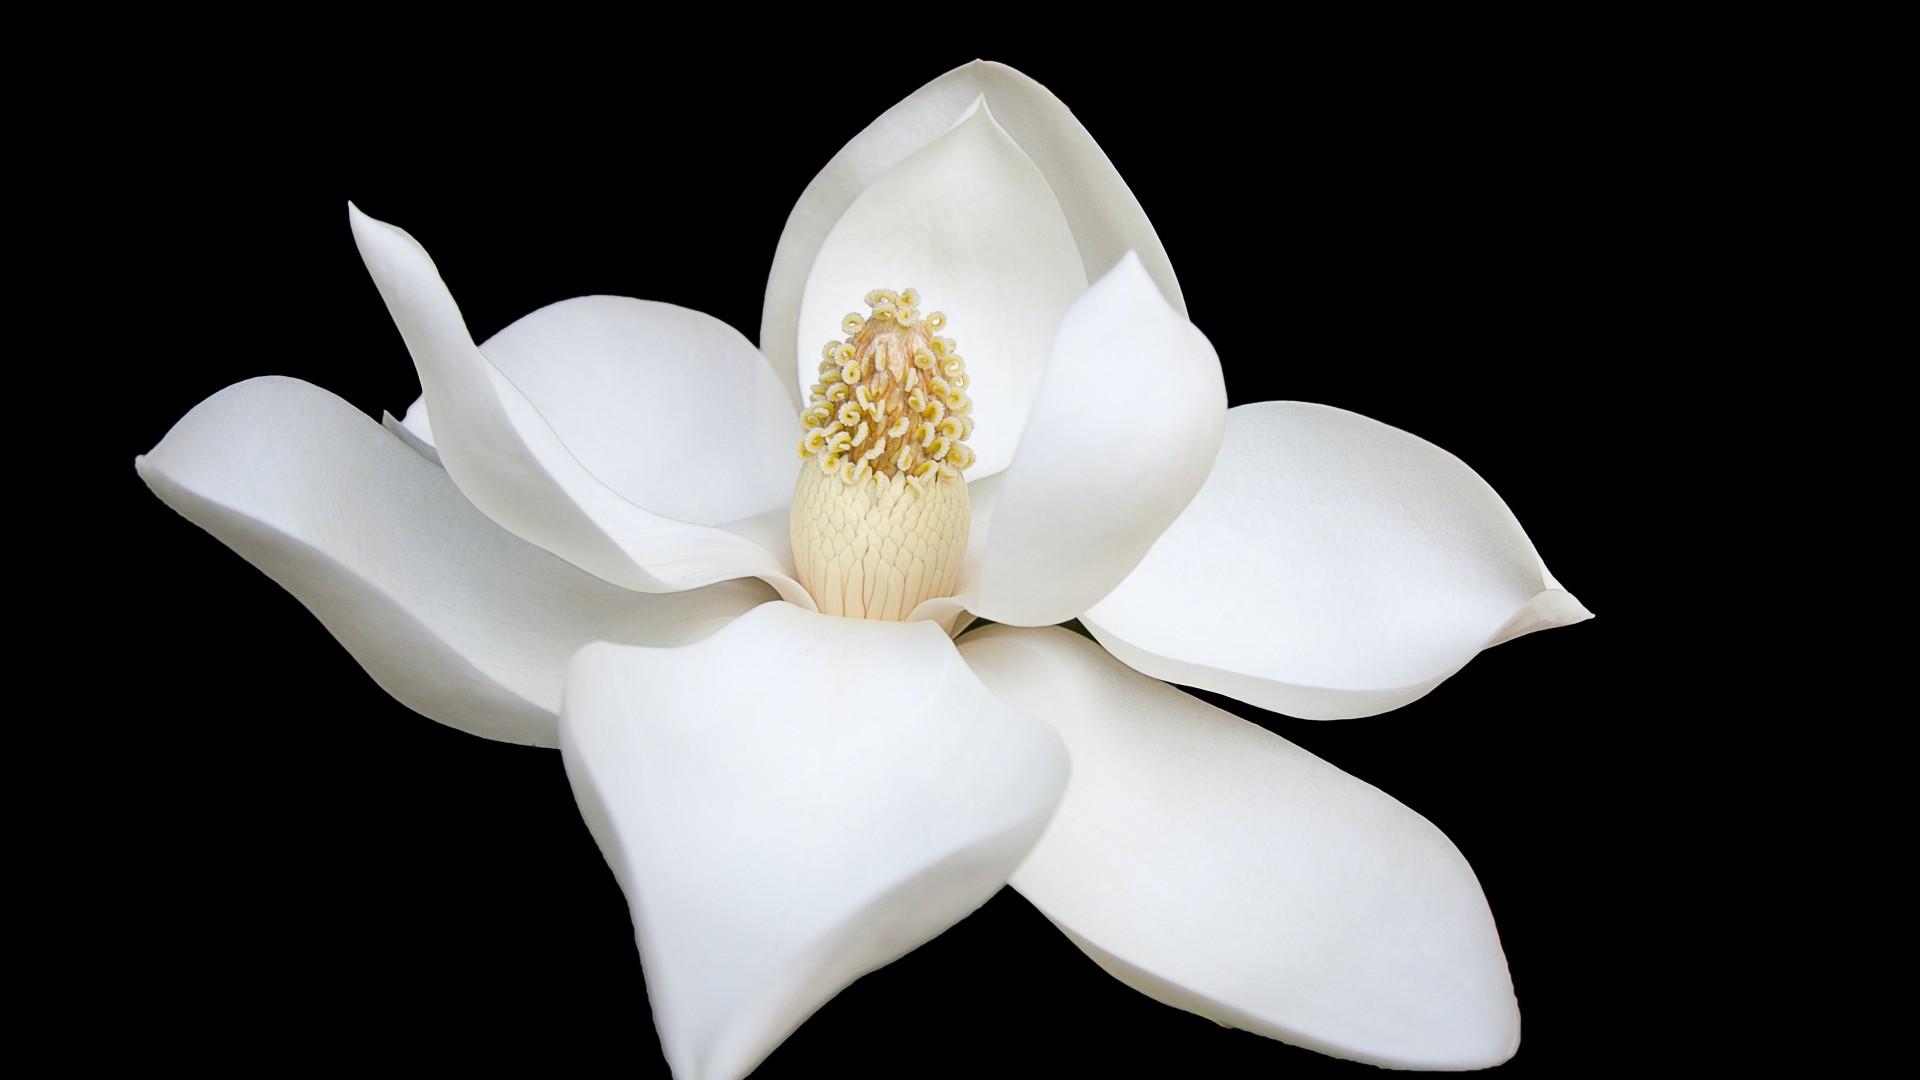 Magnolia flower with black background 4k HD flowers Wallpaper